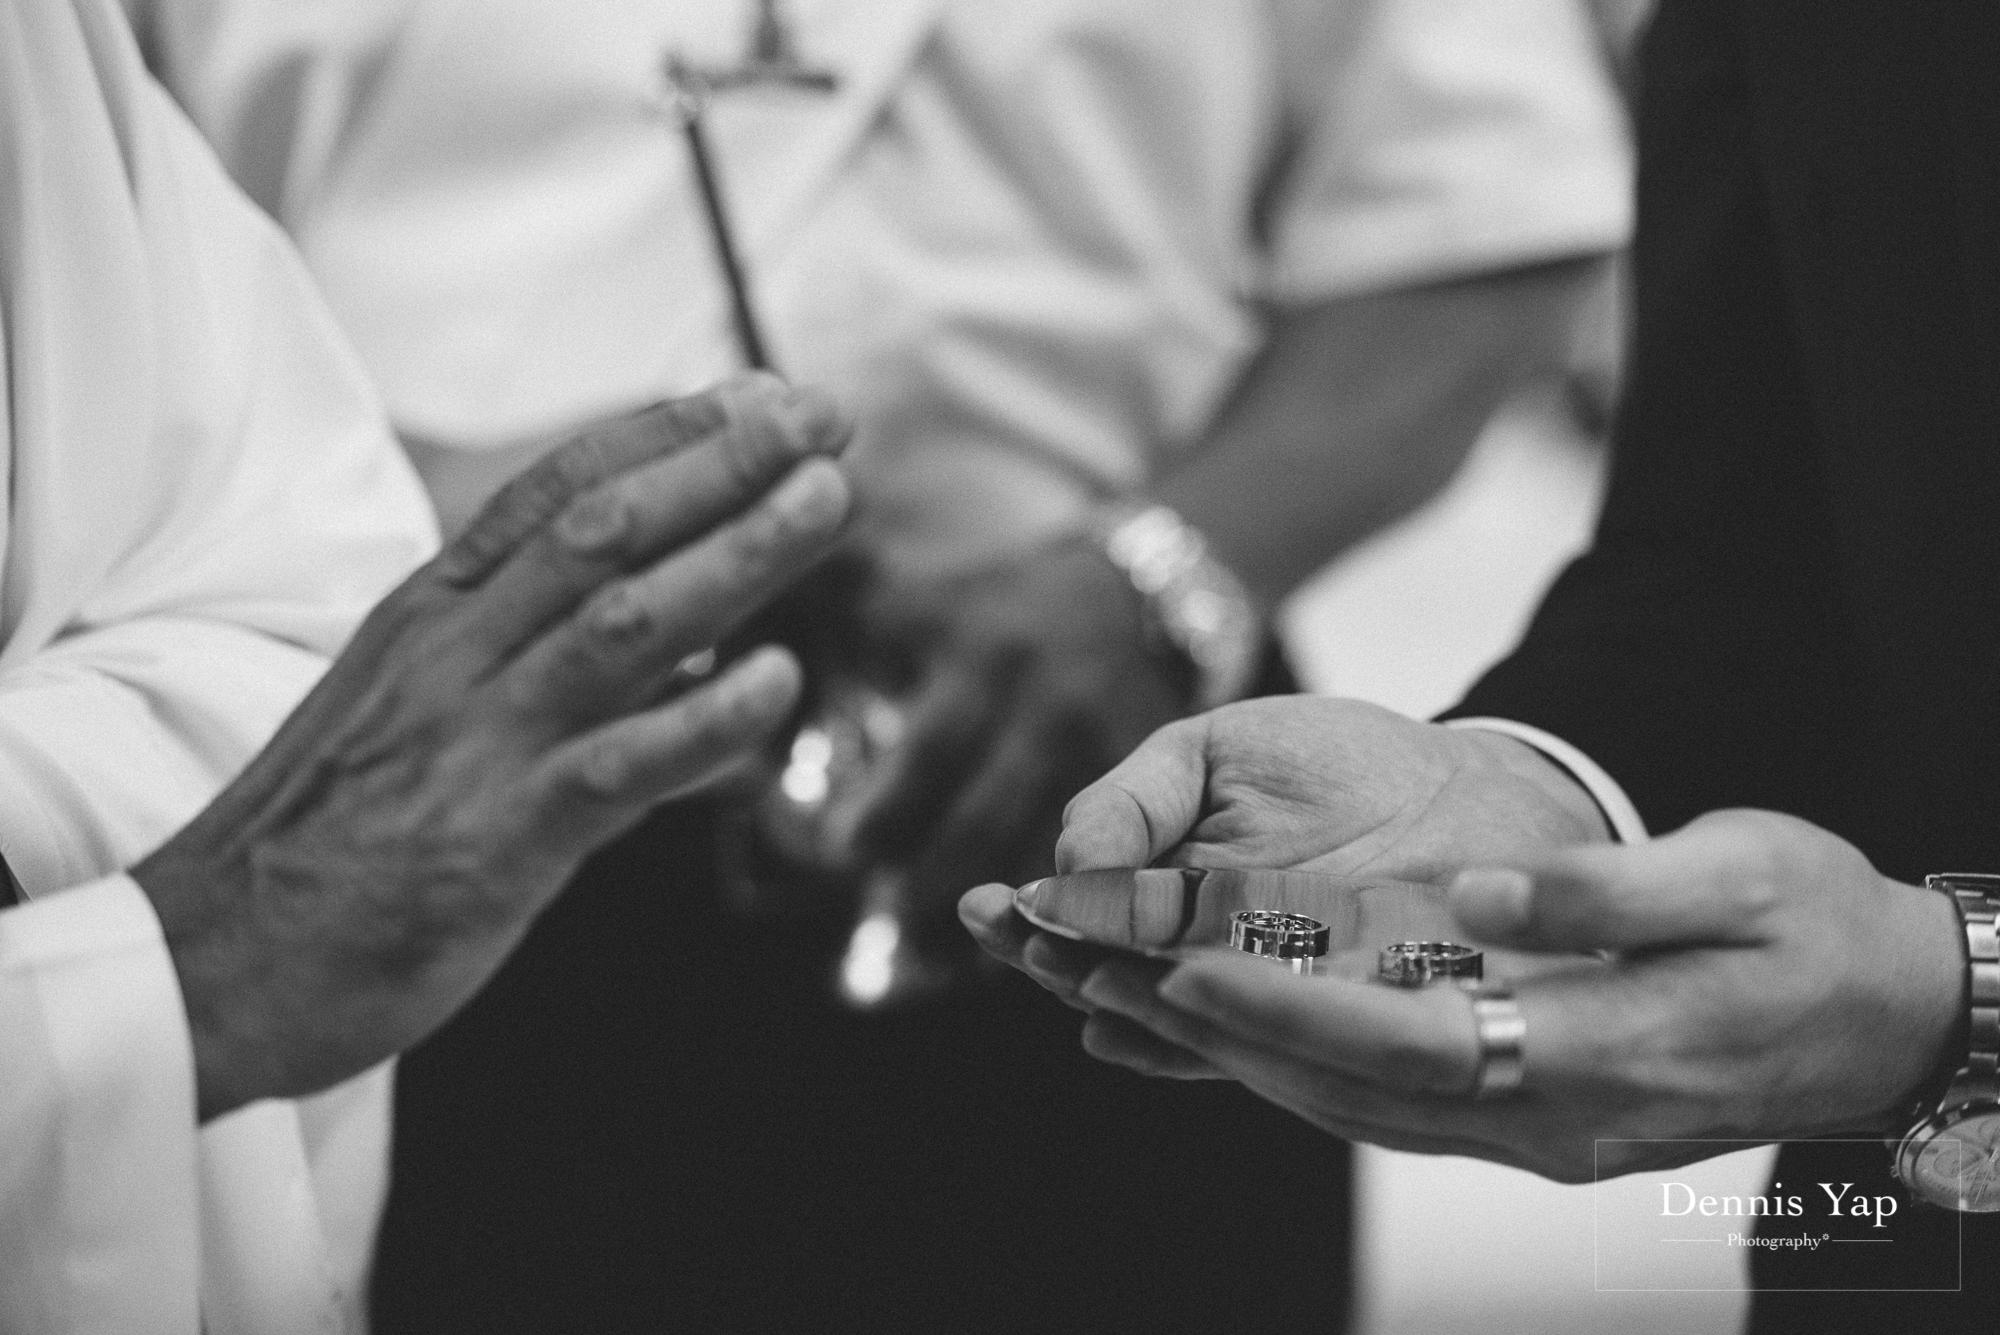 ino sheri black white church wedding st thomas more subang jaya dennis yap photography touching love beloved australia indonesia-30.jpg